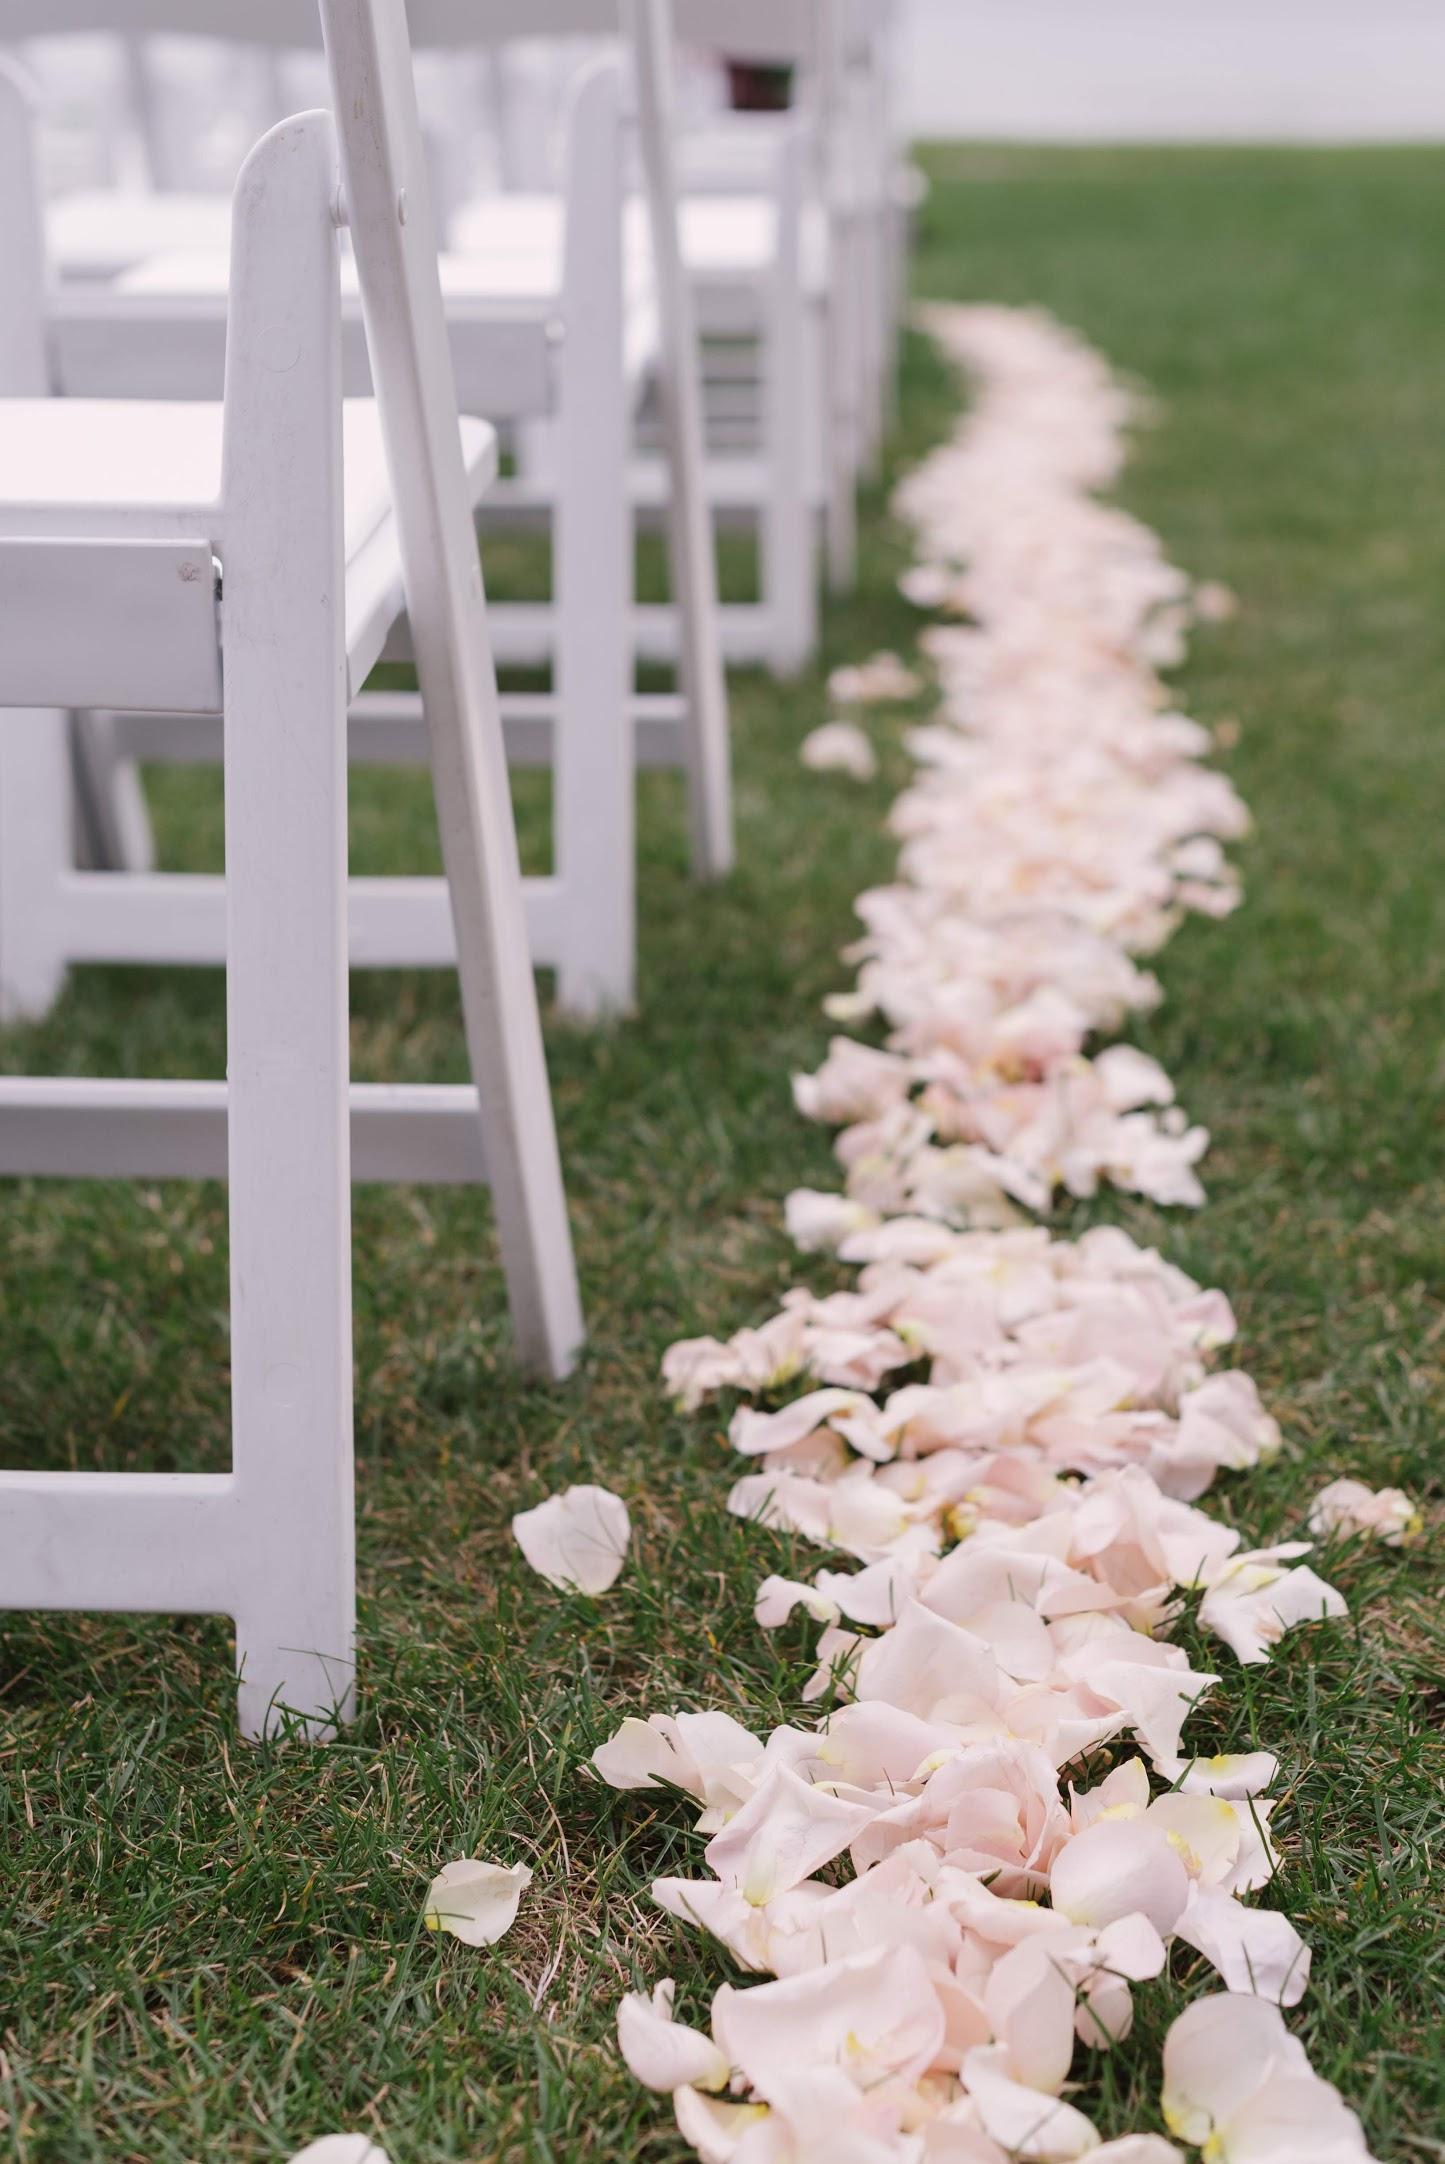 Field-Gems-Photography-Detroit-Michigan-Wedding-Photographer-Family-Photographer-Photobooth-090818-549.jpg